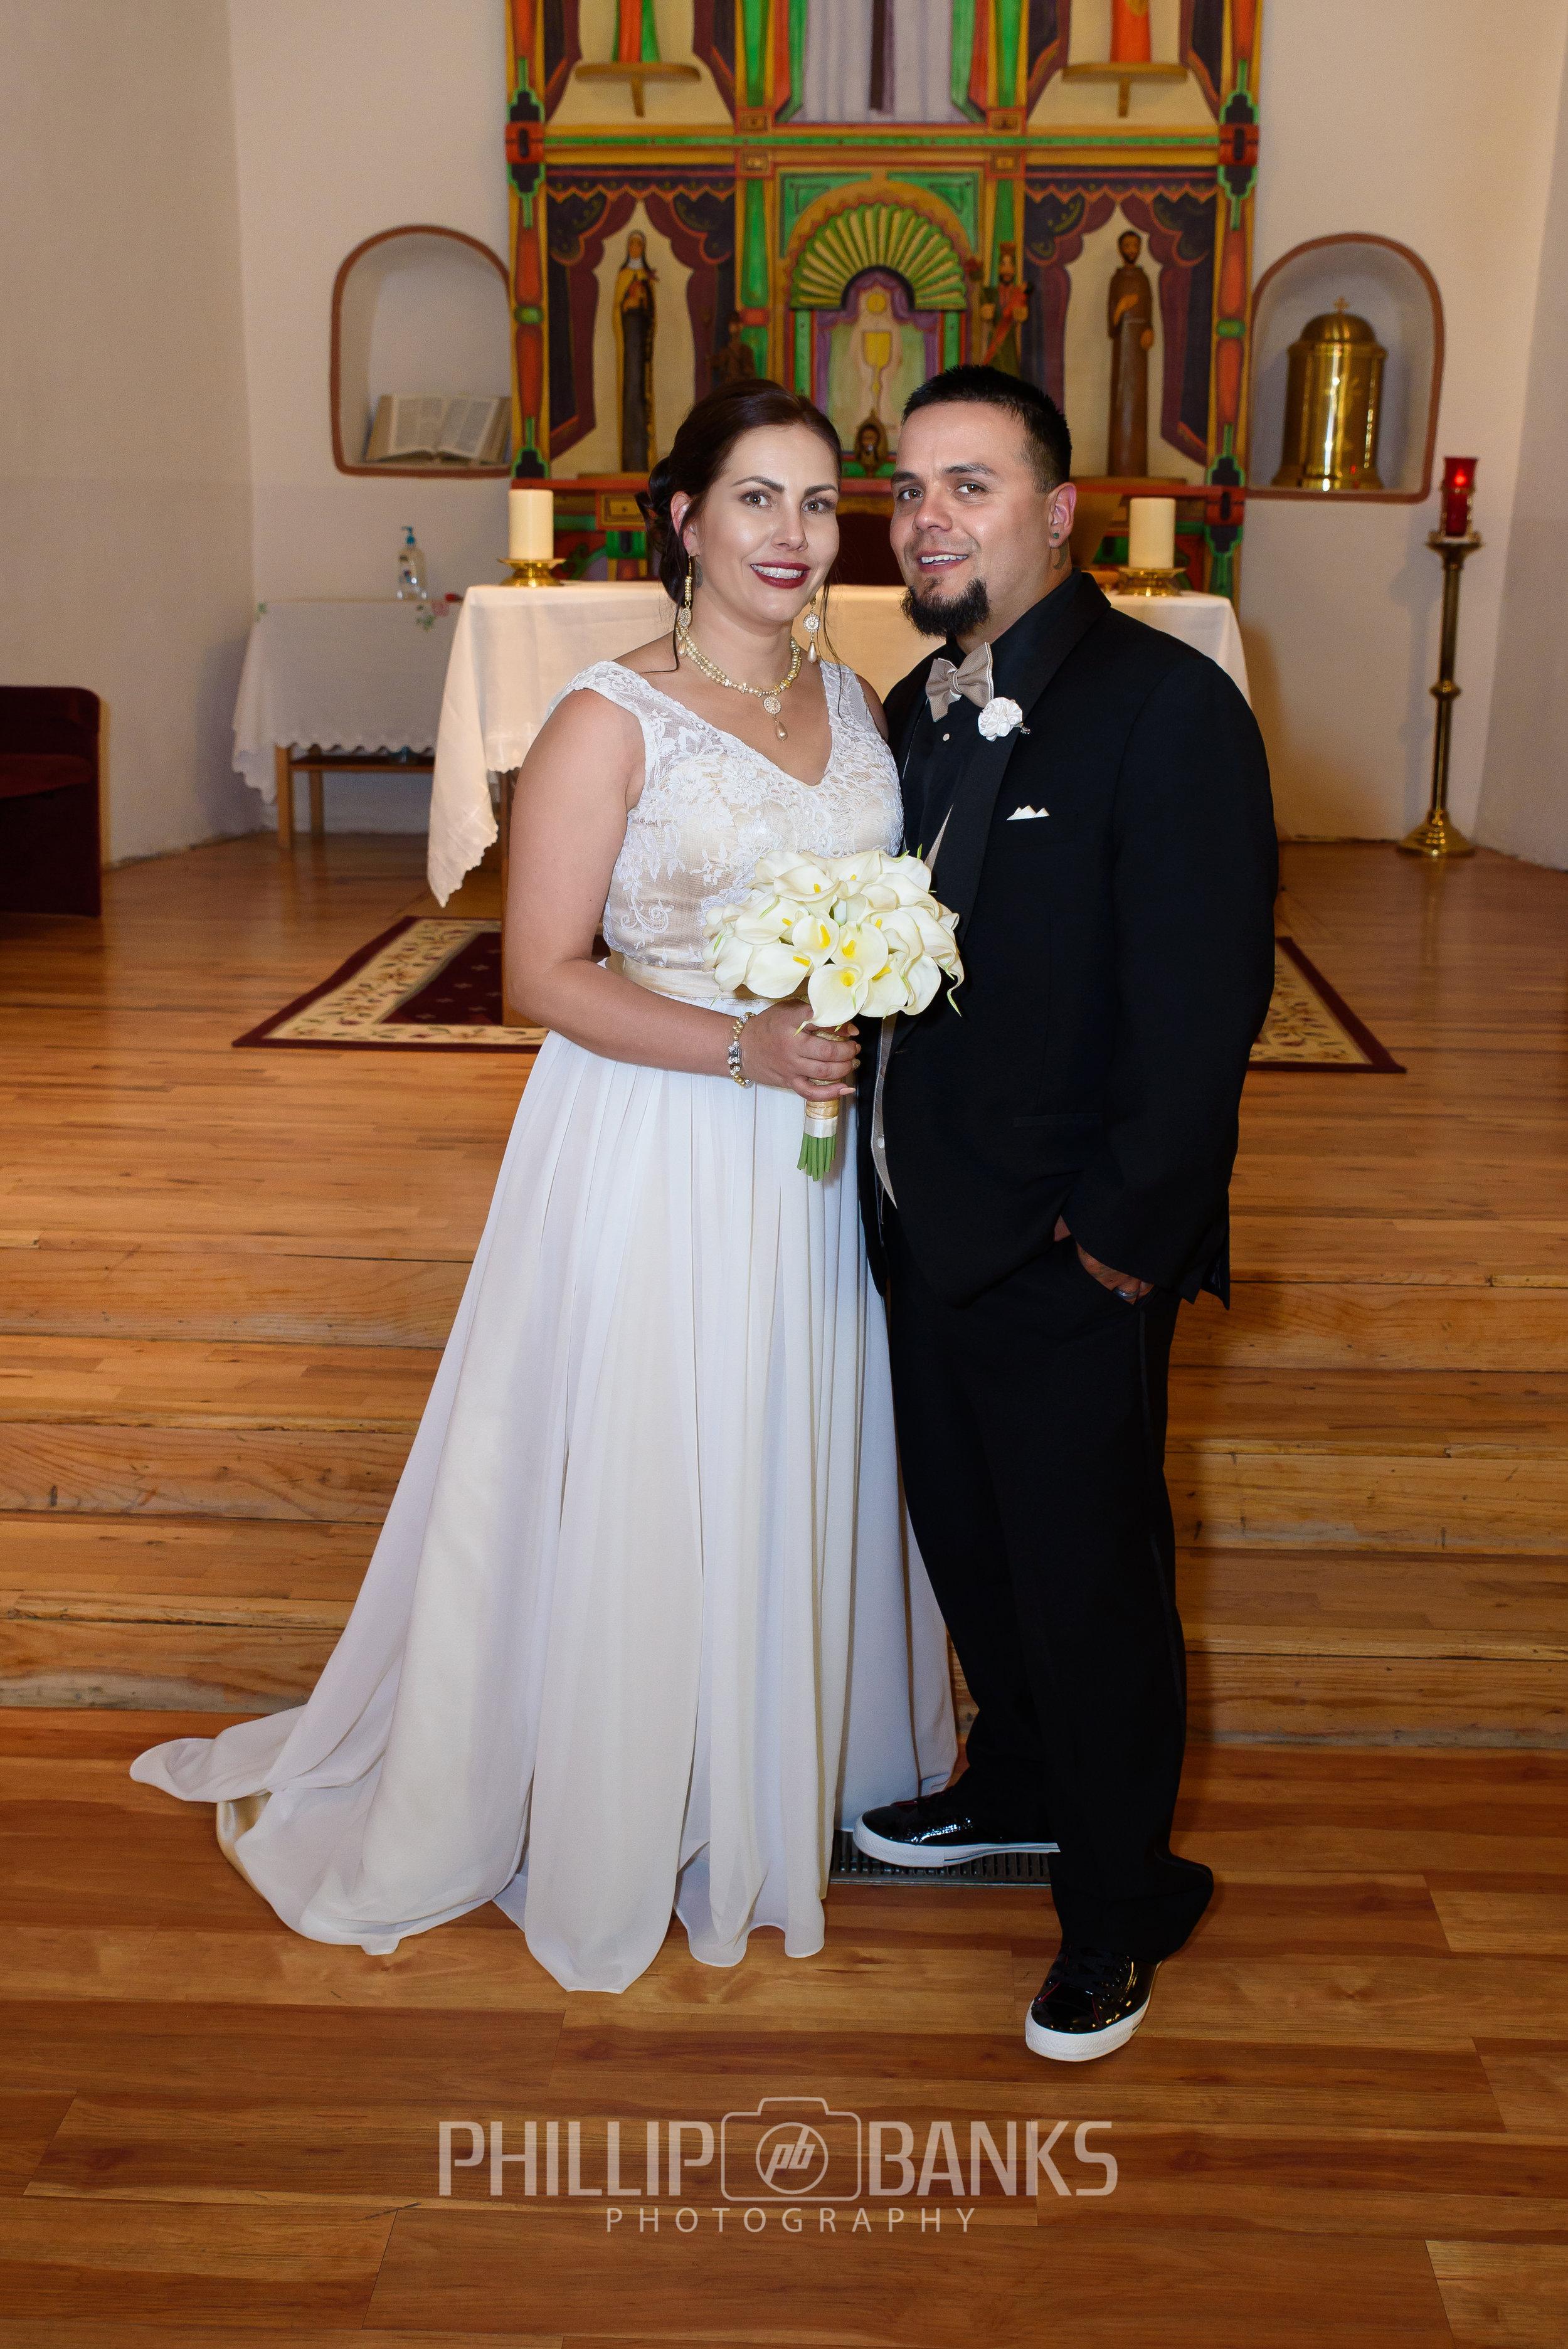 Albuquerque Wedding Photographer Phillip Banks Photography-Martinez Santa Fe Wedding-1.jpg